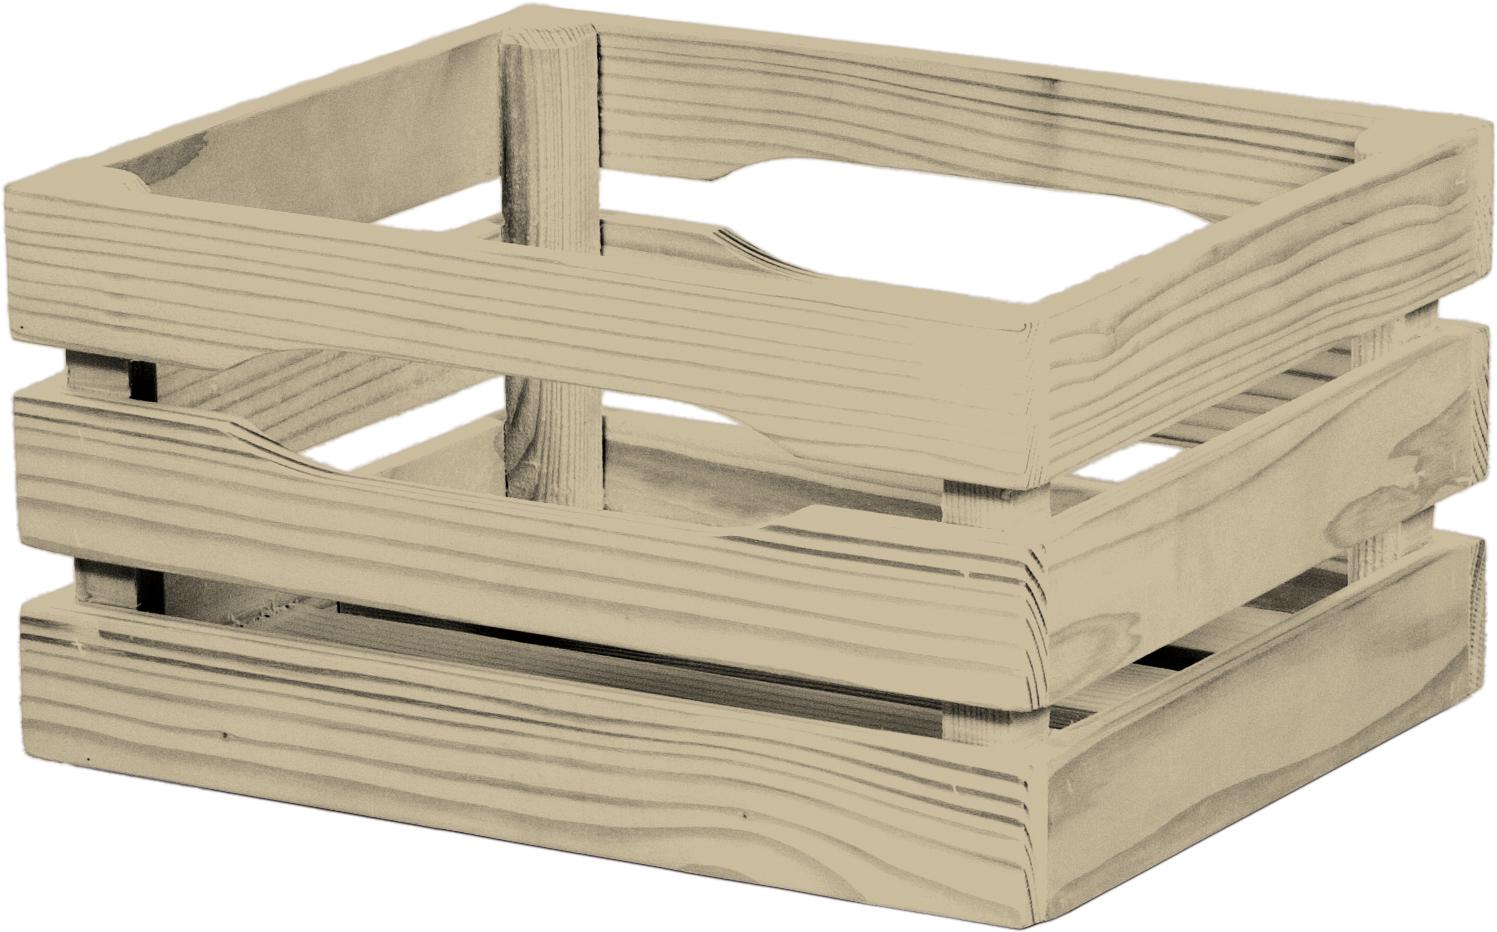 STORAGE BOX SMALL  w 28 x d 23 x h 15 cm  € 20  Product Code: BOX-S